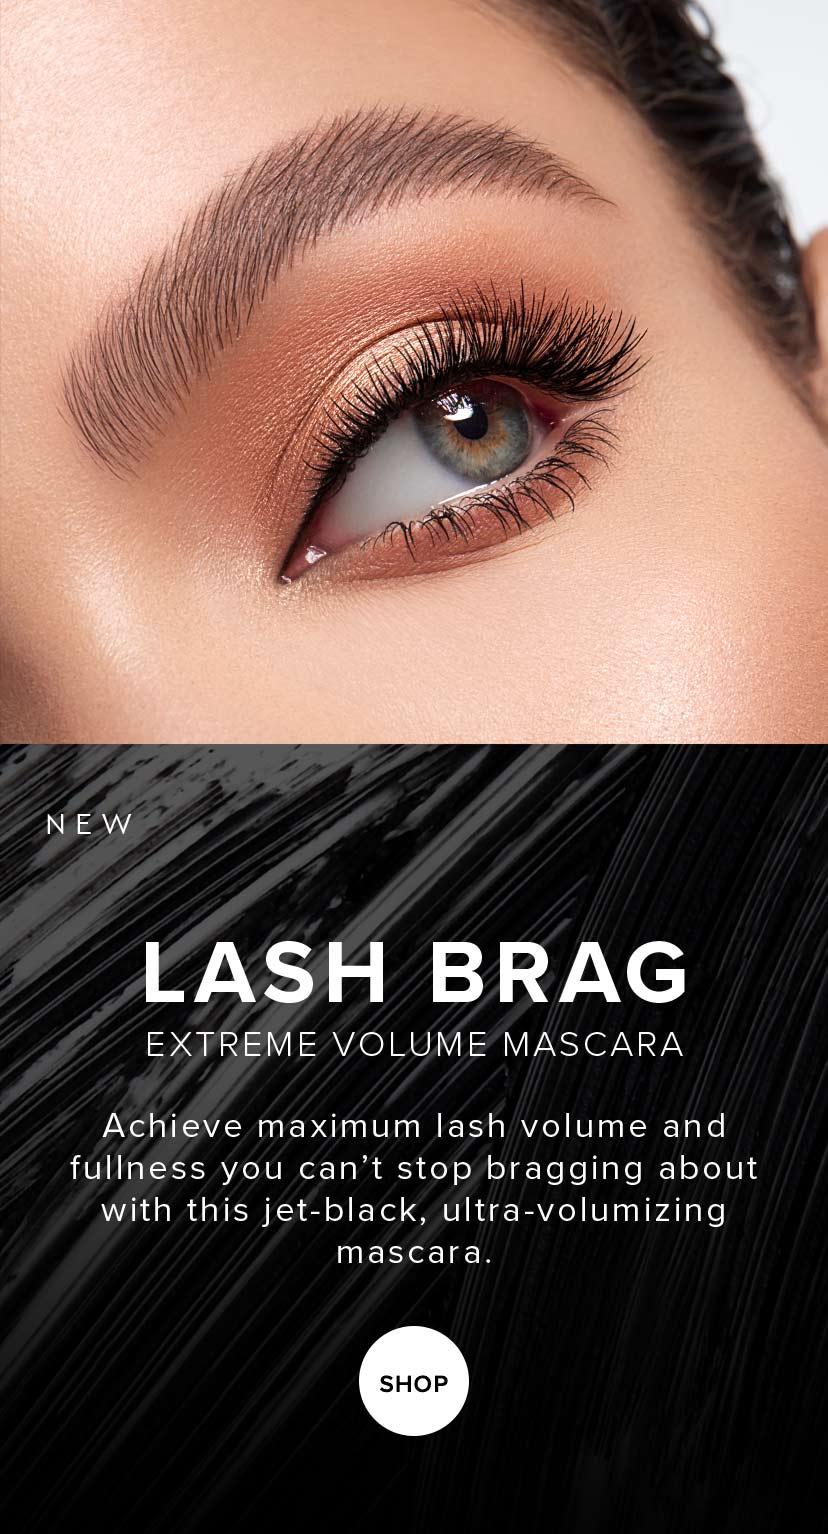 Lash Brag Extreme Volume Mascara